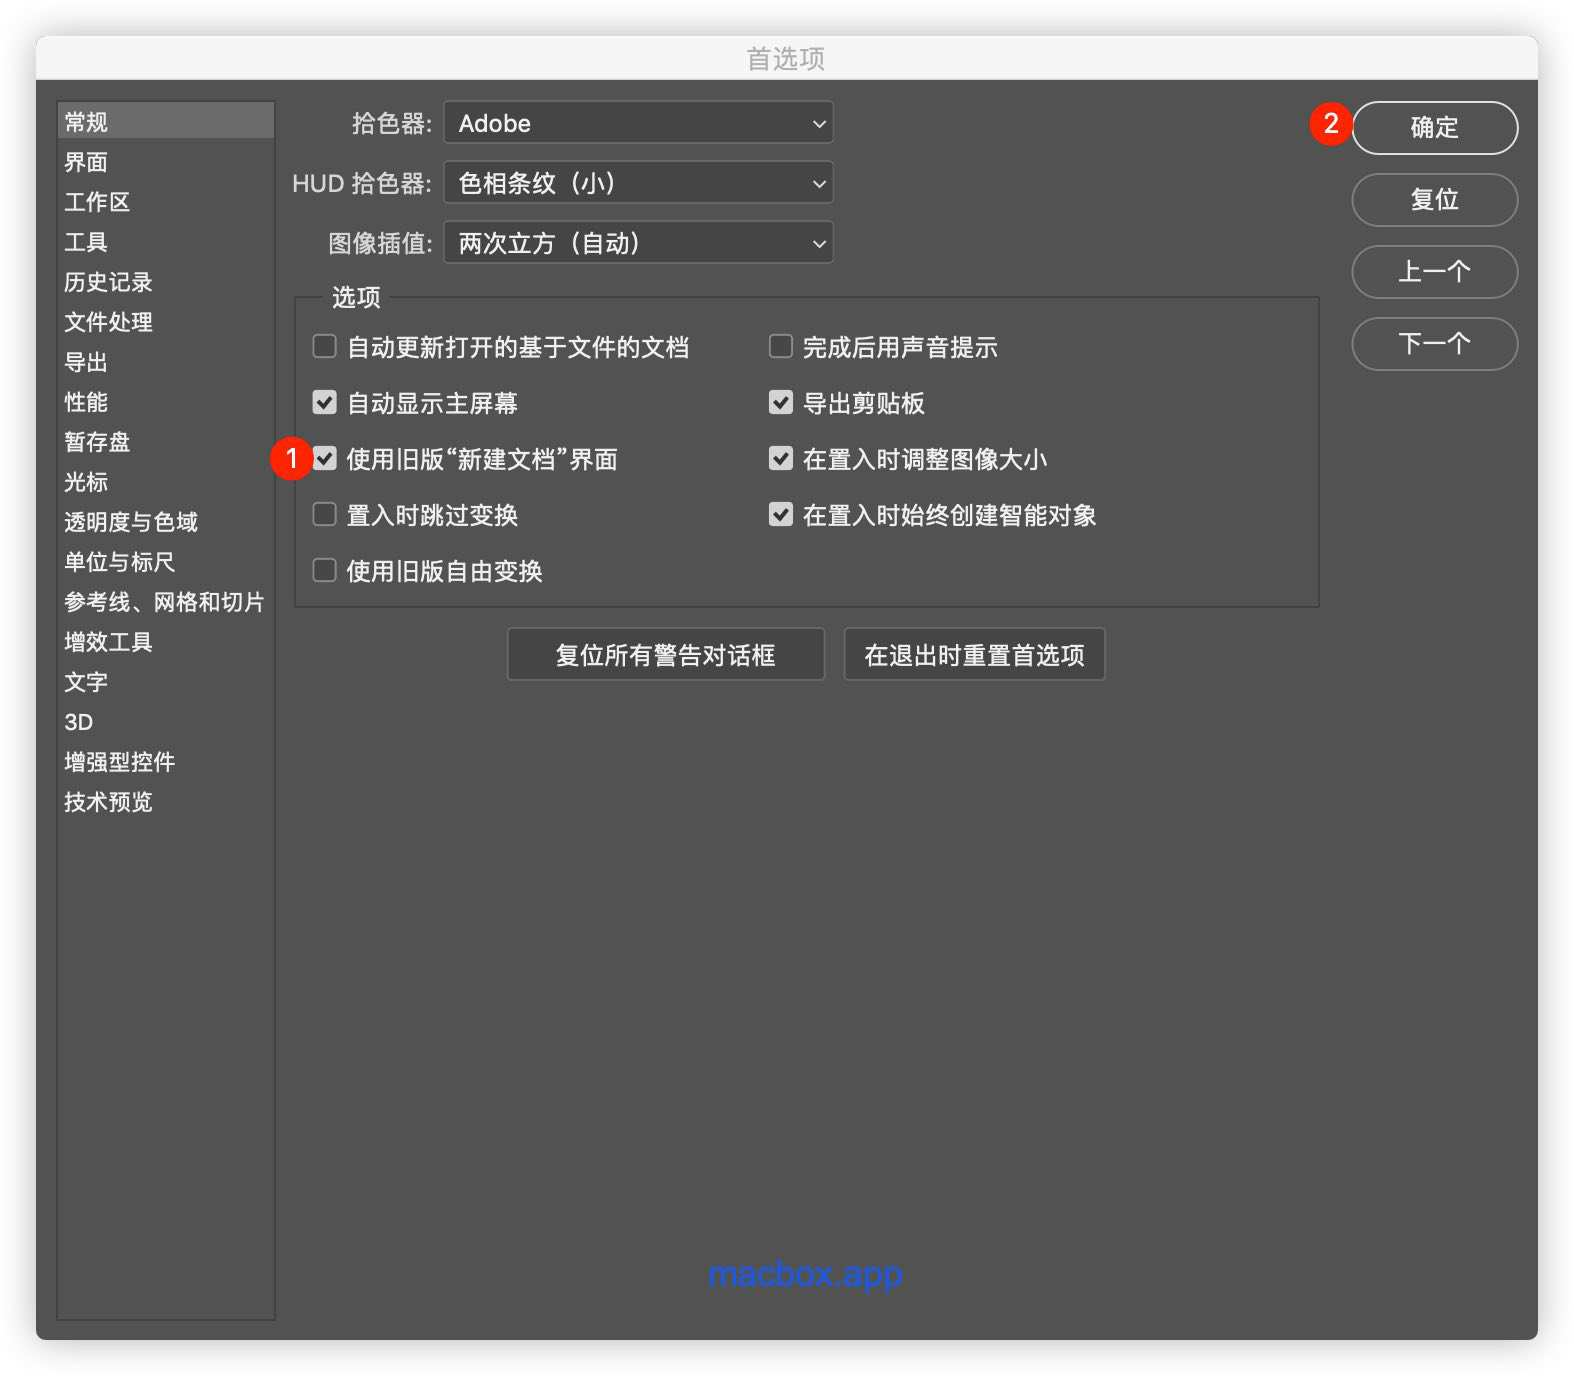 ps mac版切换为旧版新建文档界面